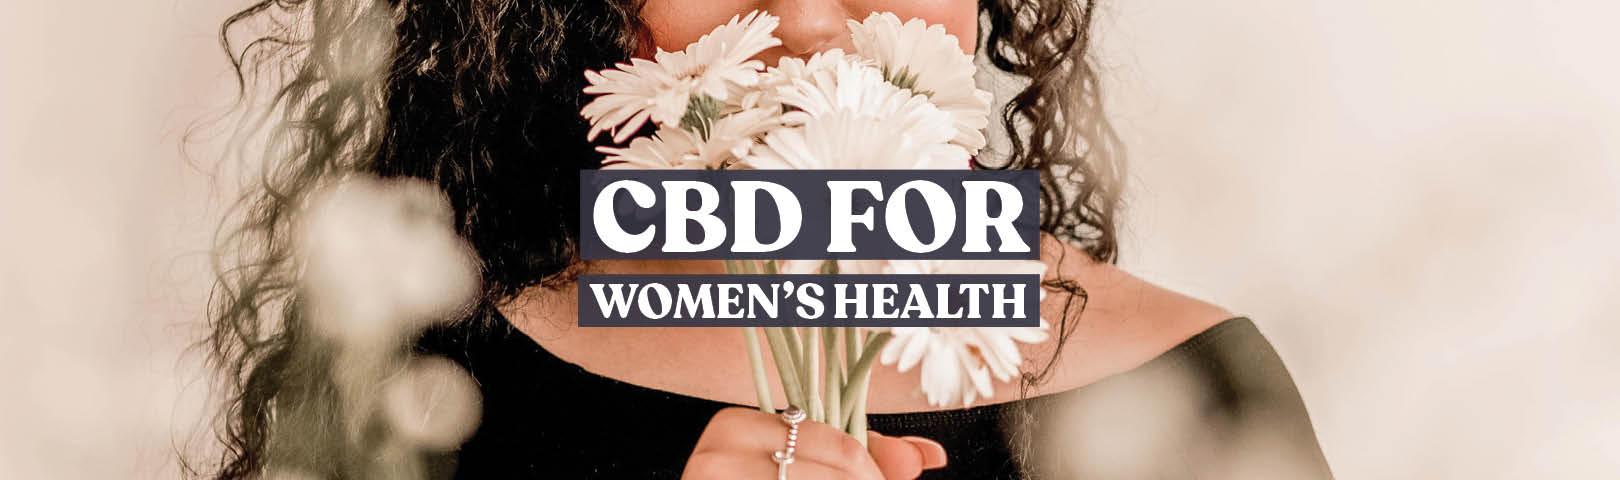 cbd for womens health